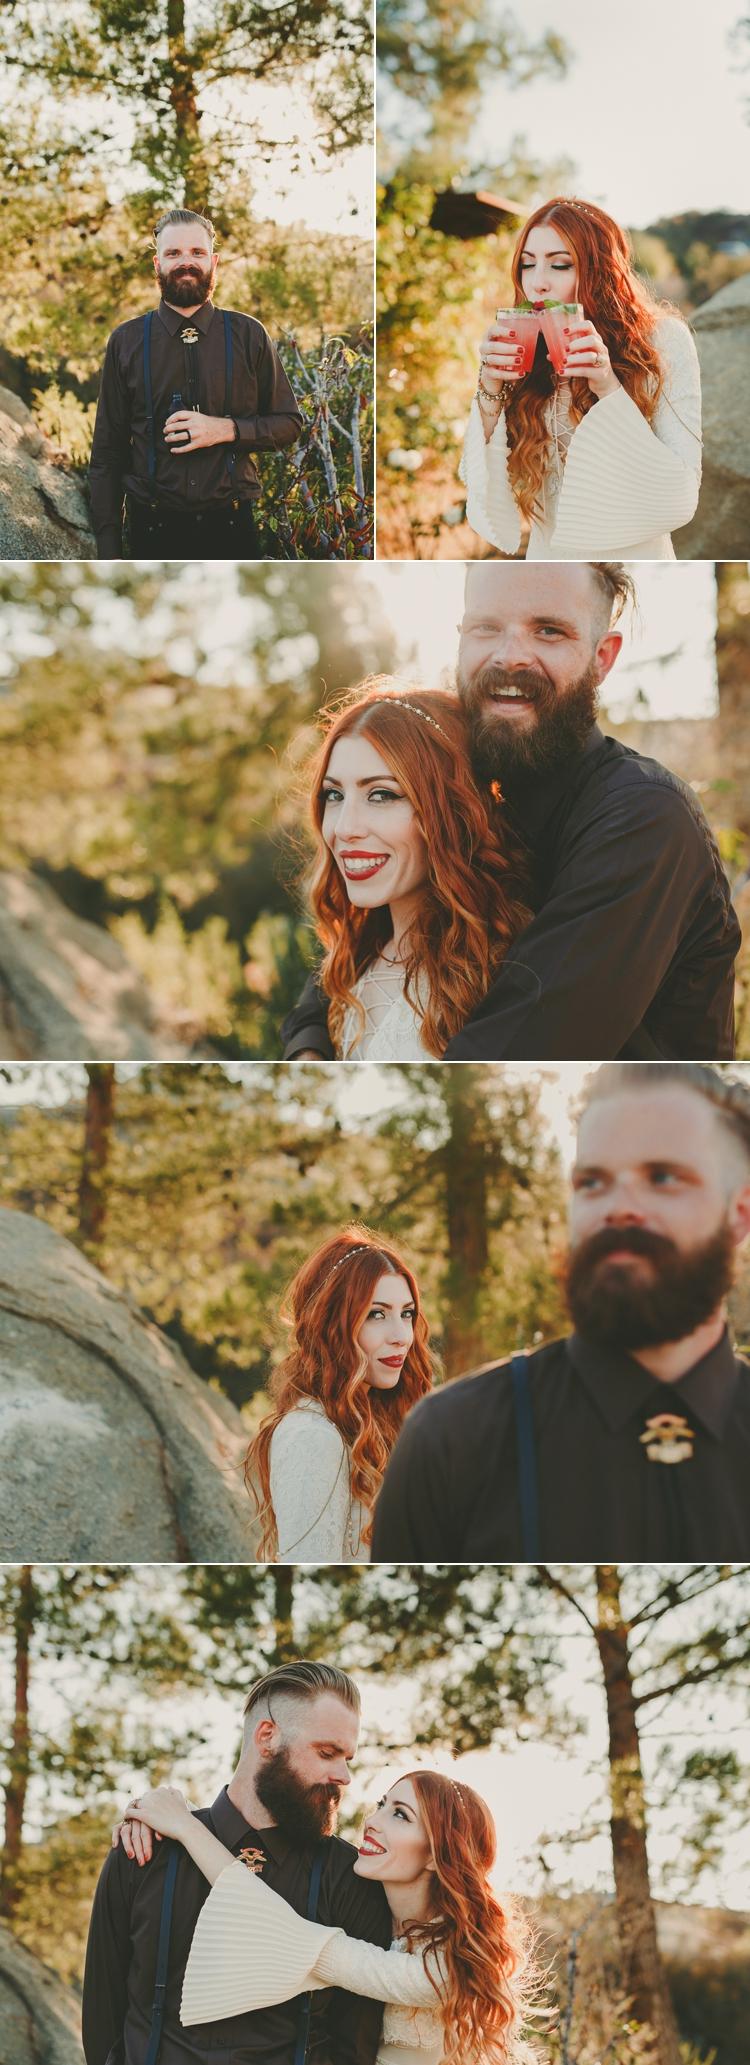 woodstock-inspired-wedding-photos-21